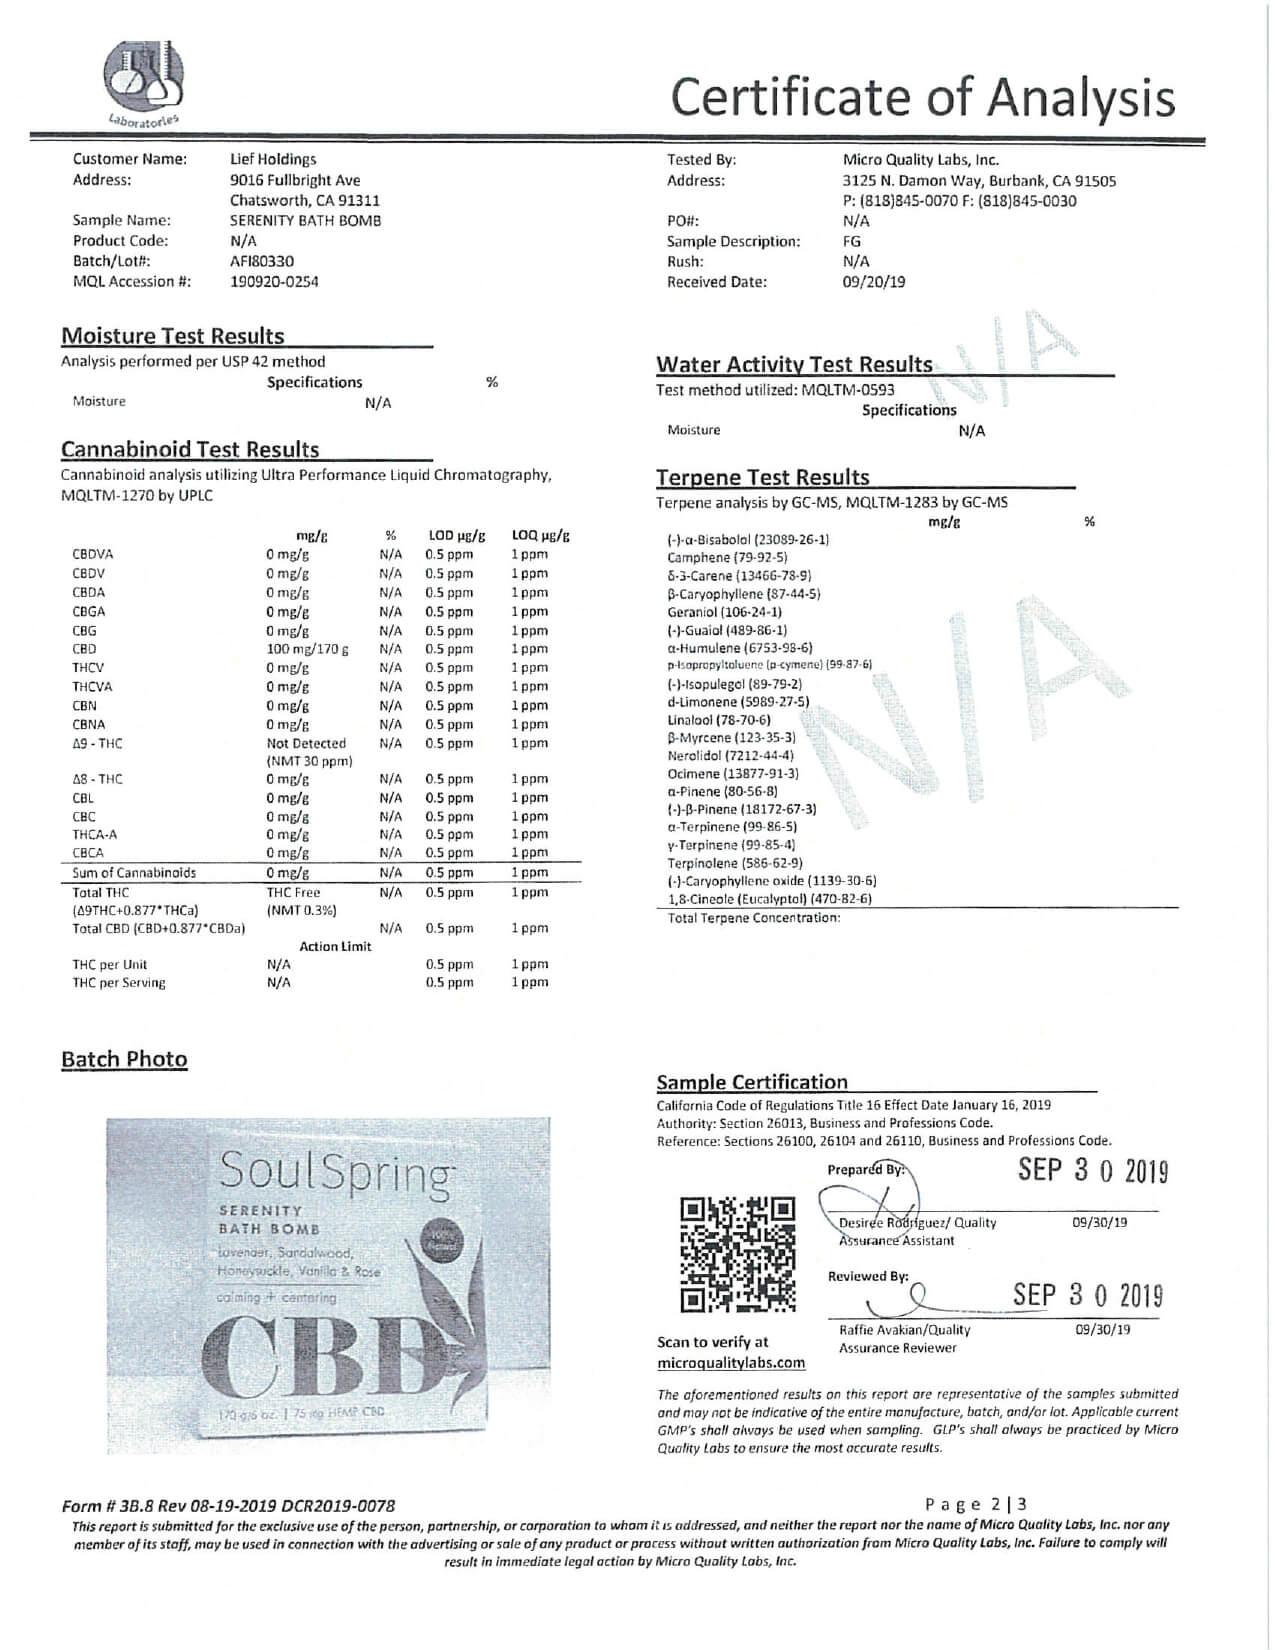 SoulSpring CBD Bath Serenity Bath Bomb Lab Report